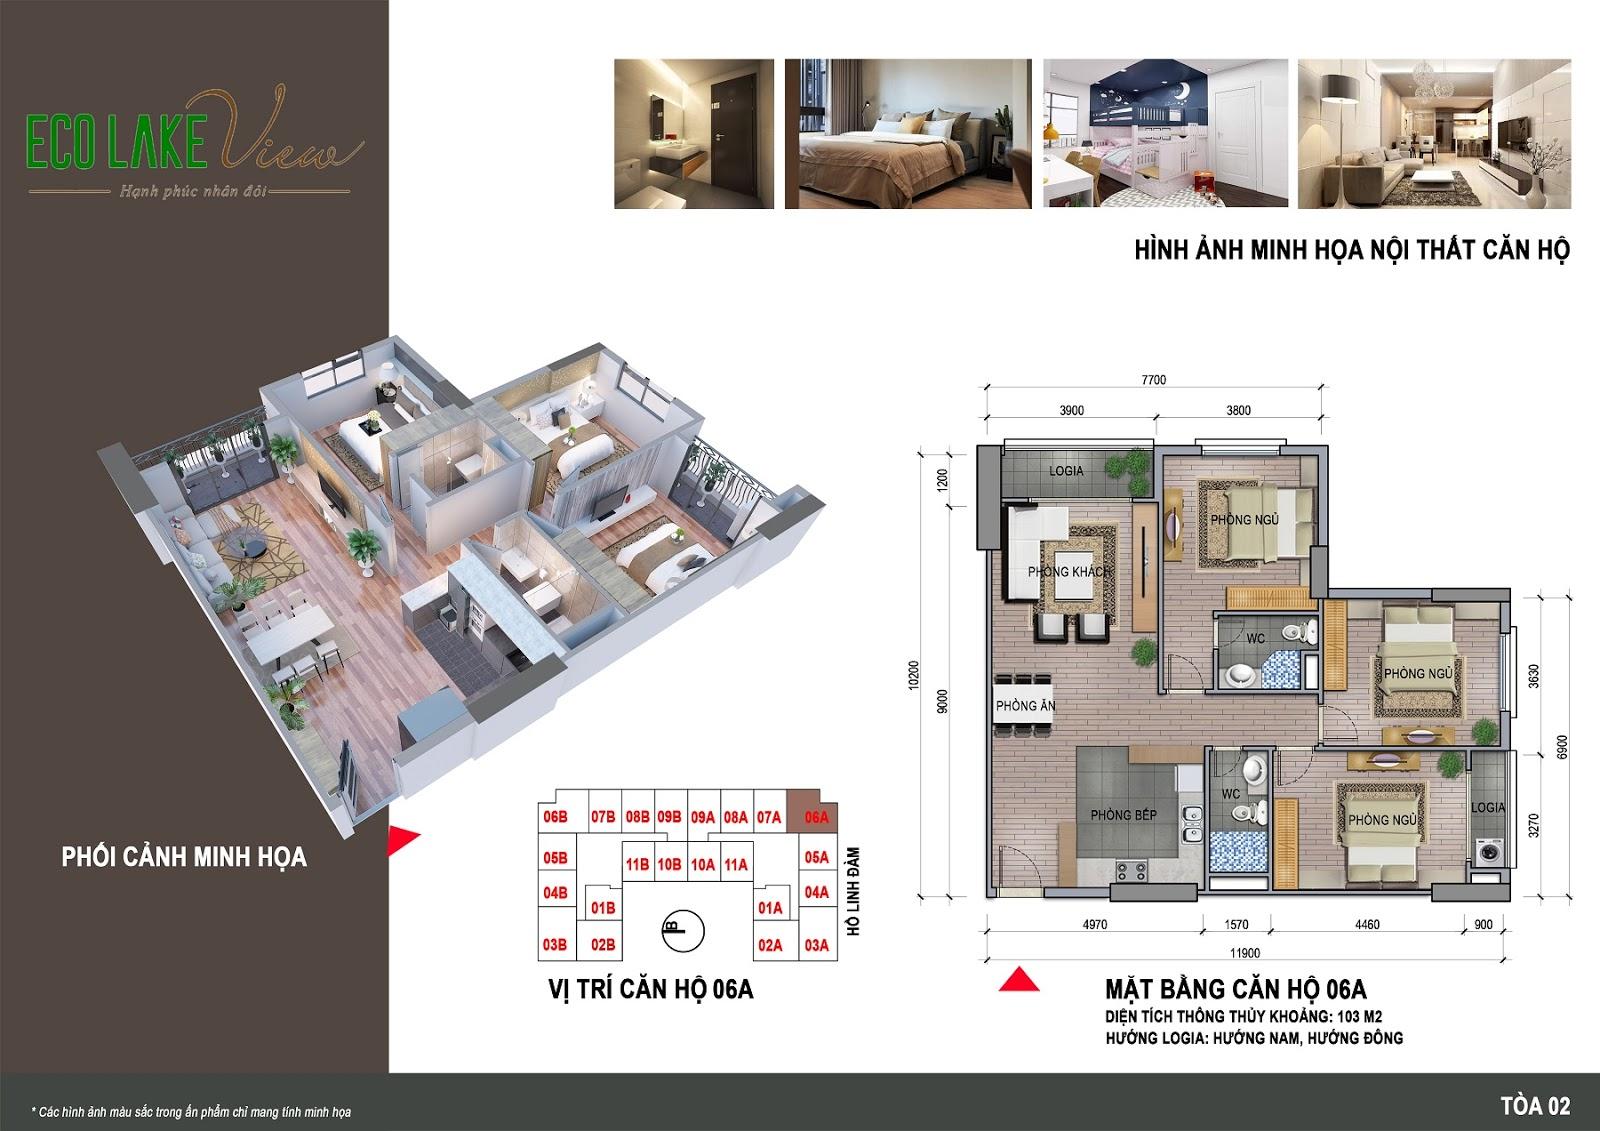 Thiết kế căn hộ 06A - 103m - HH02 Eco Lake View